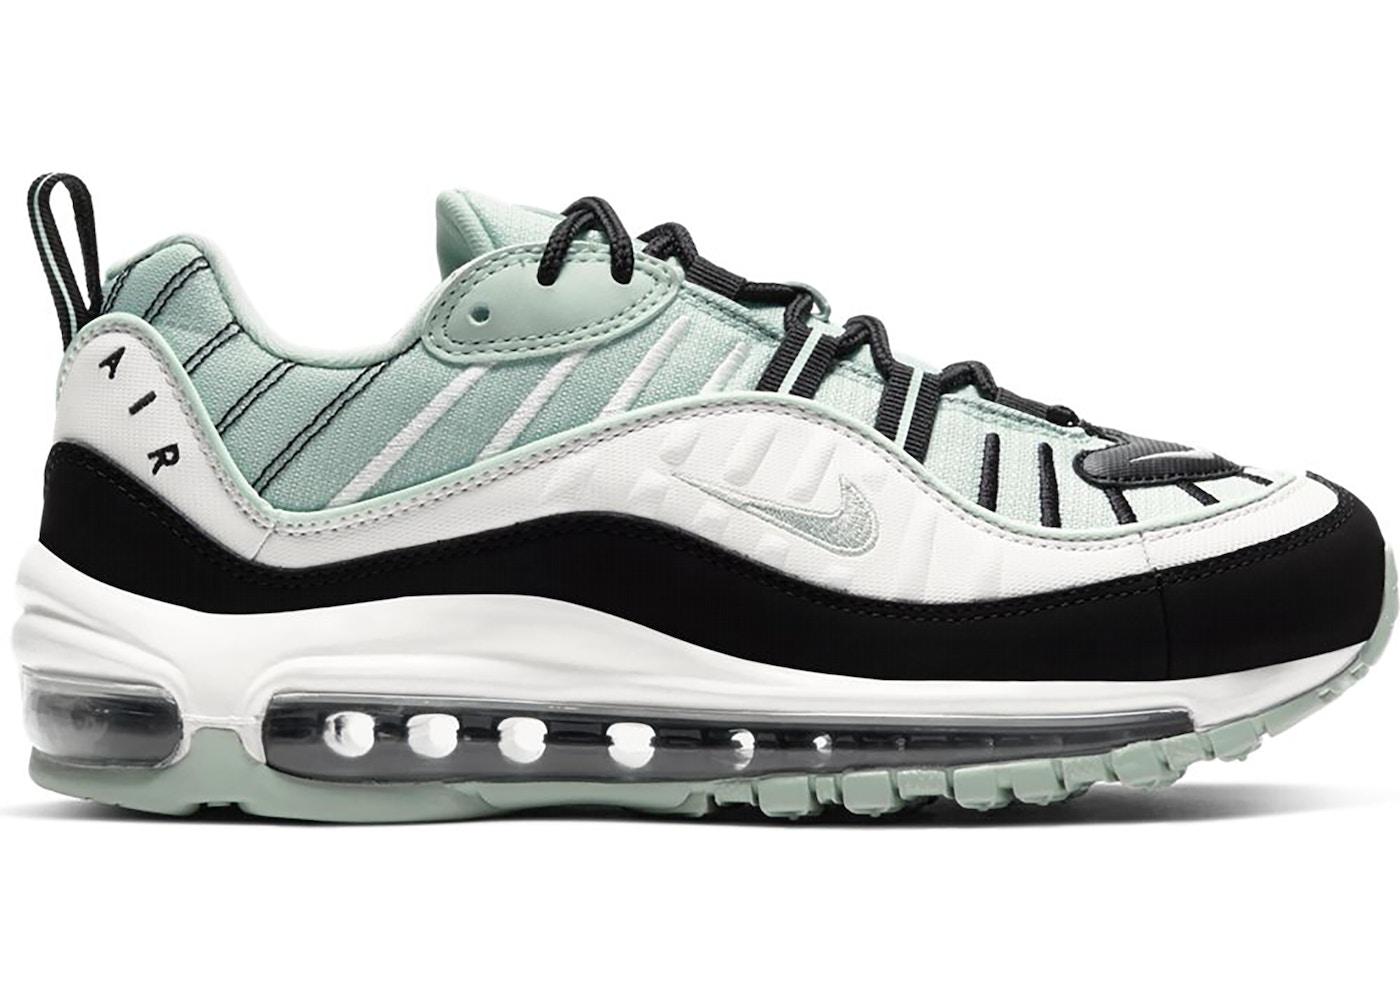 Nike Air Max 98 Pistachio Frost (W)